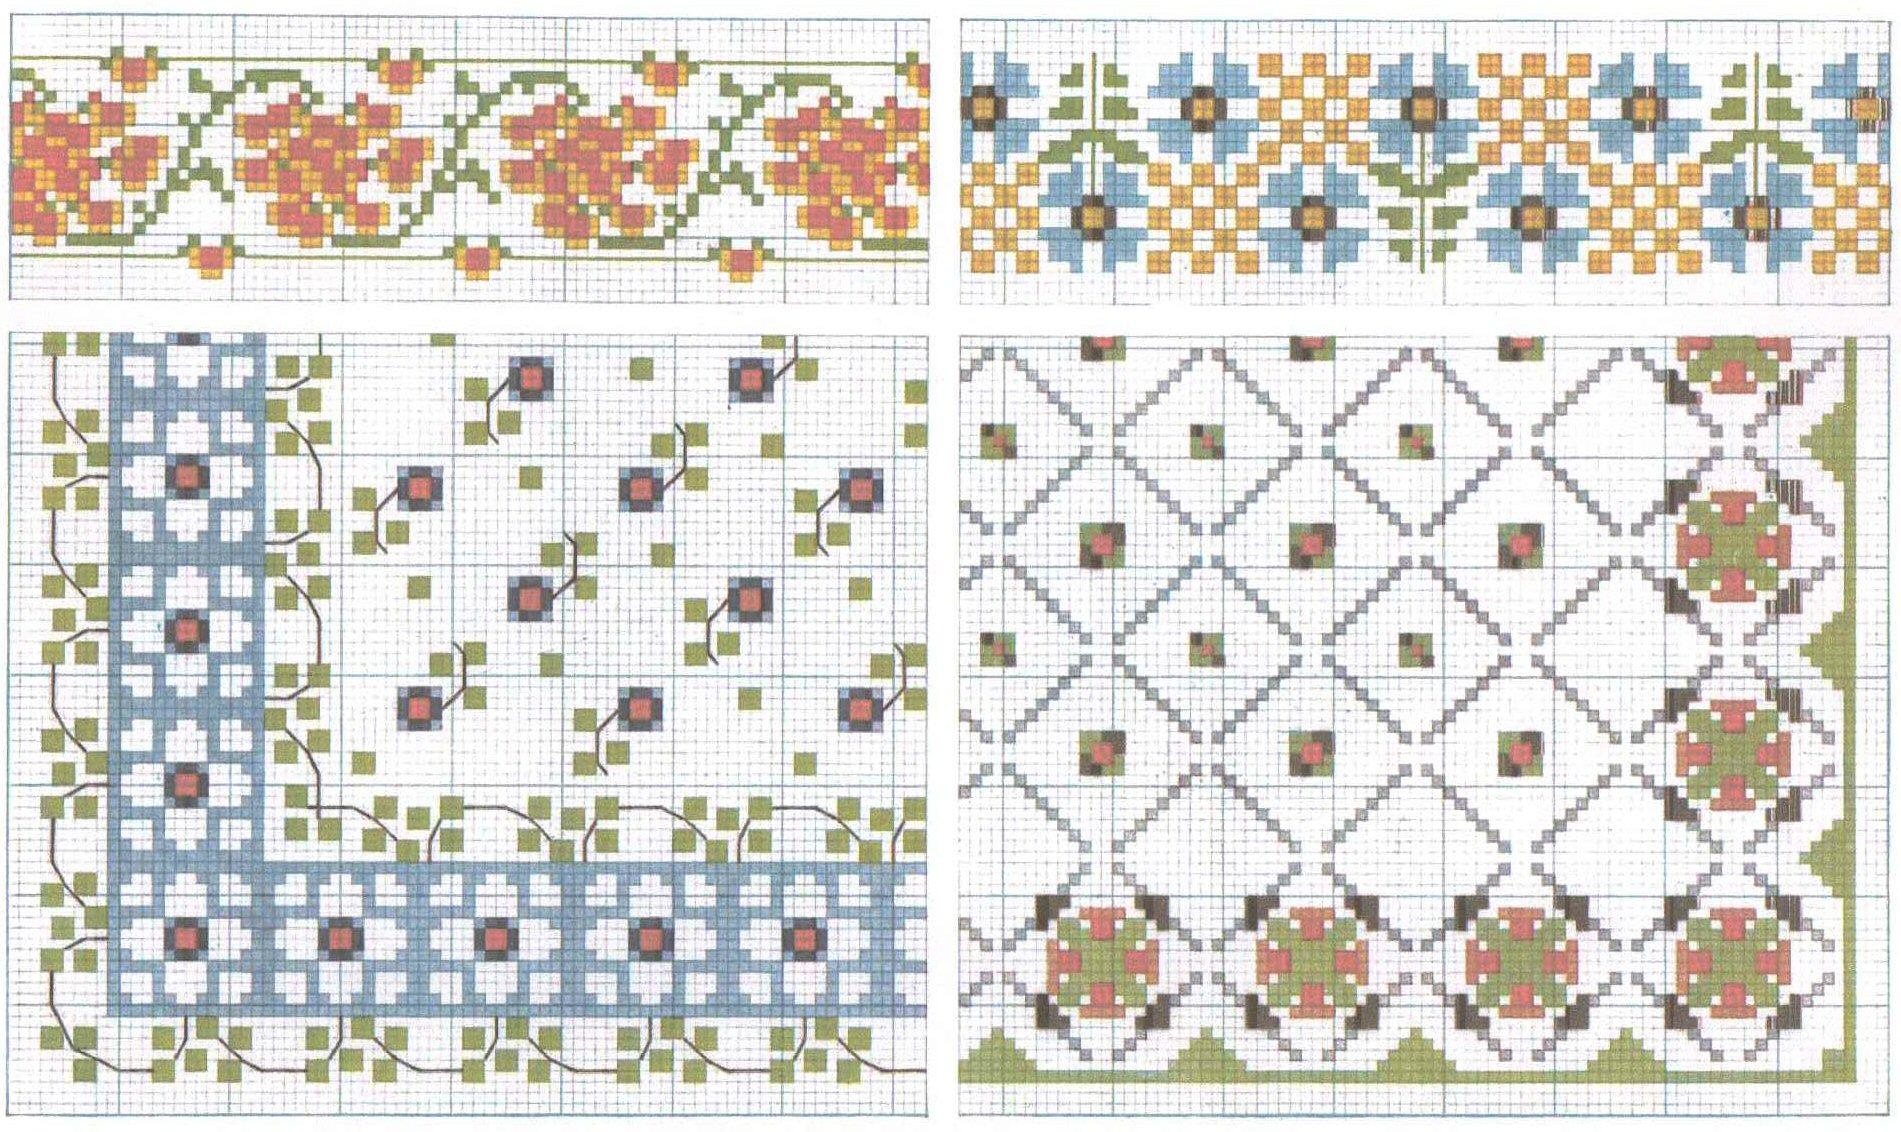 Bathroom Tile Design Software Free Download Chart Paper Border Designs Joy Studio Design Gallery